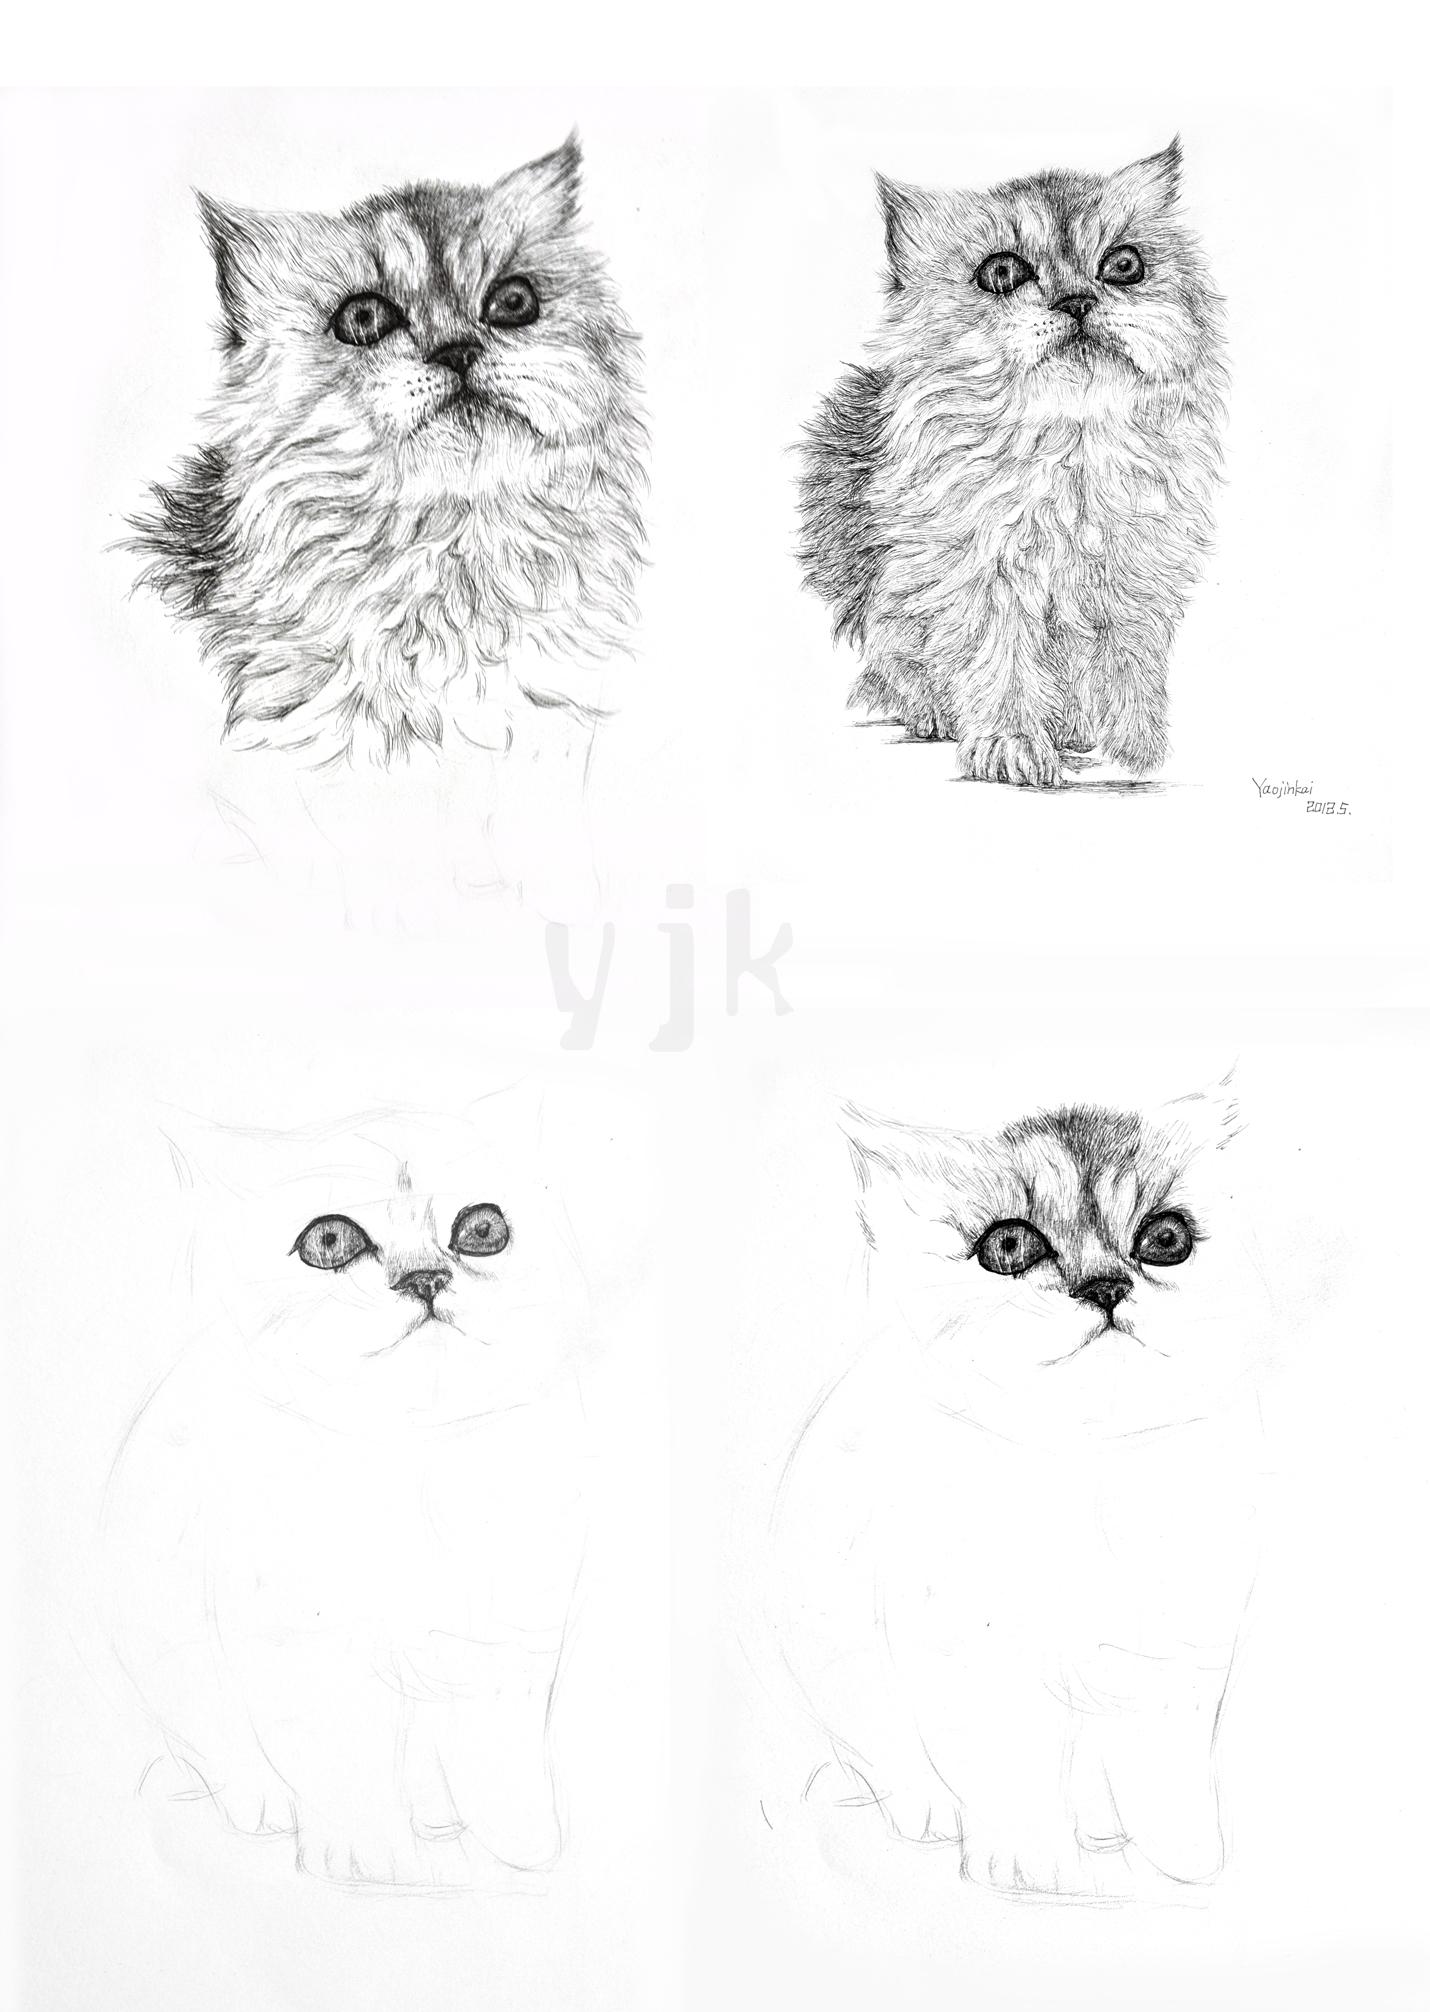 yjk-钢笔画-猫咪